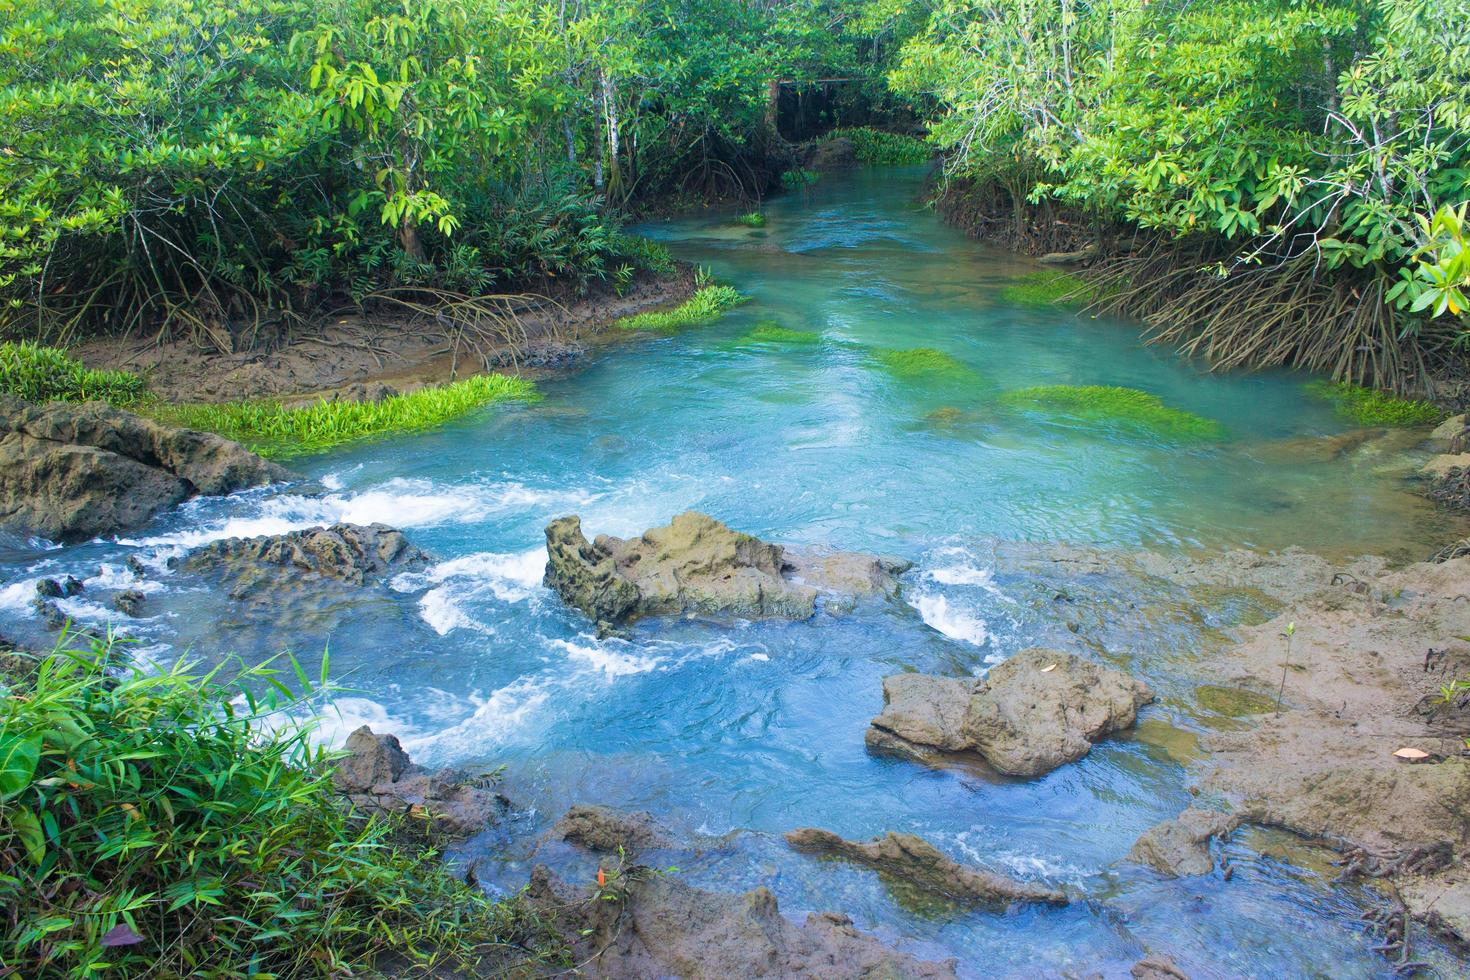 foresta di mangrovie e un fiume foto